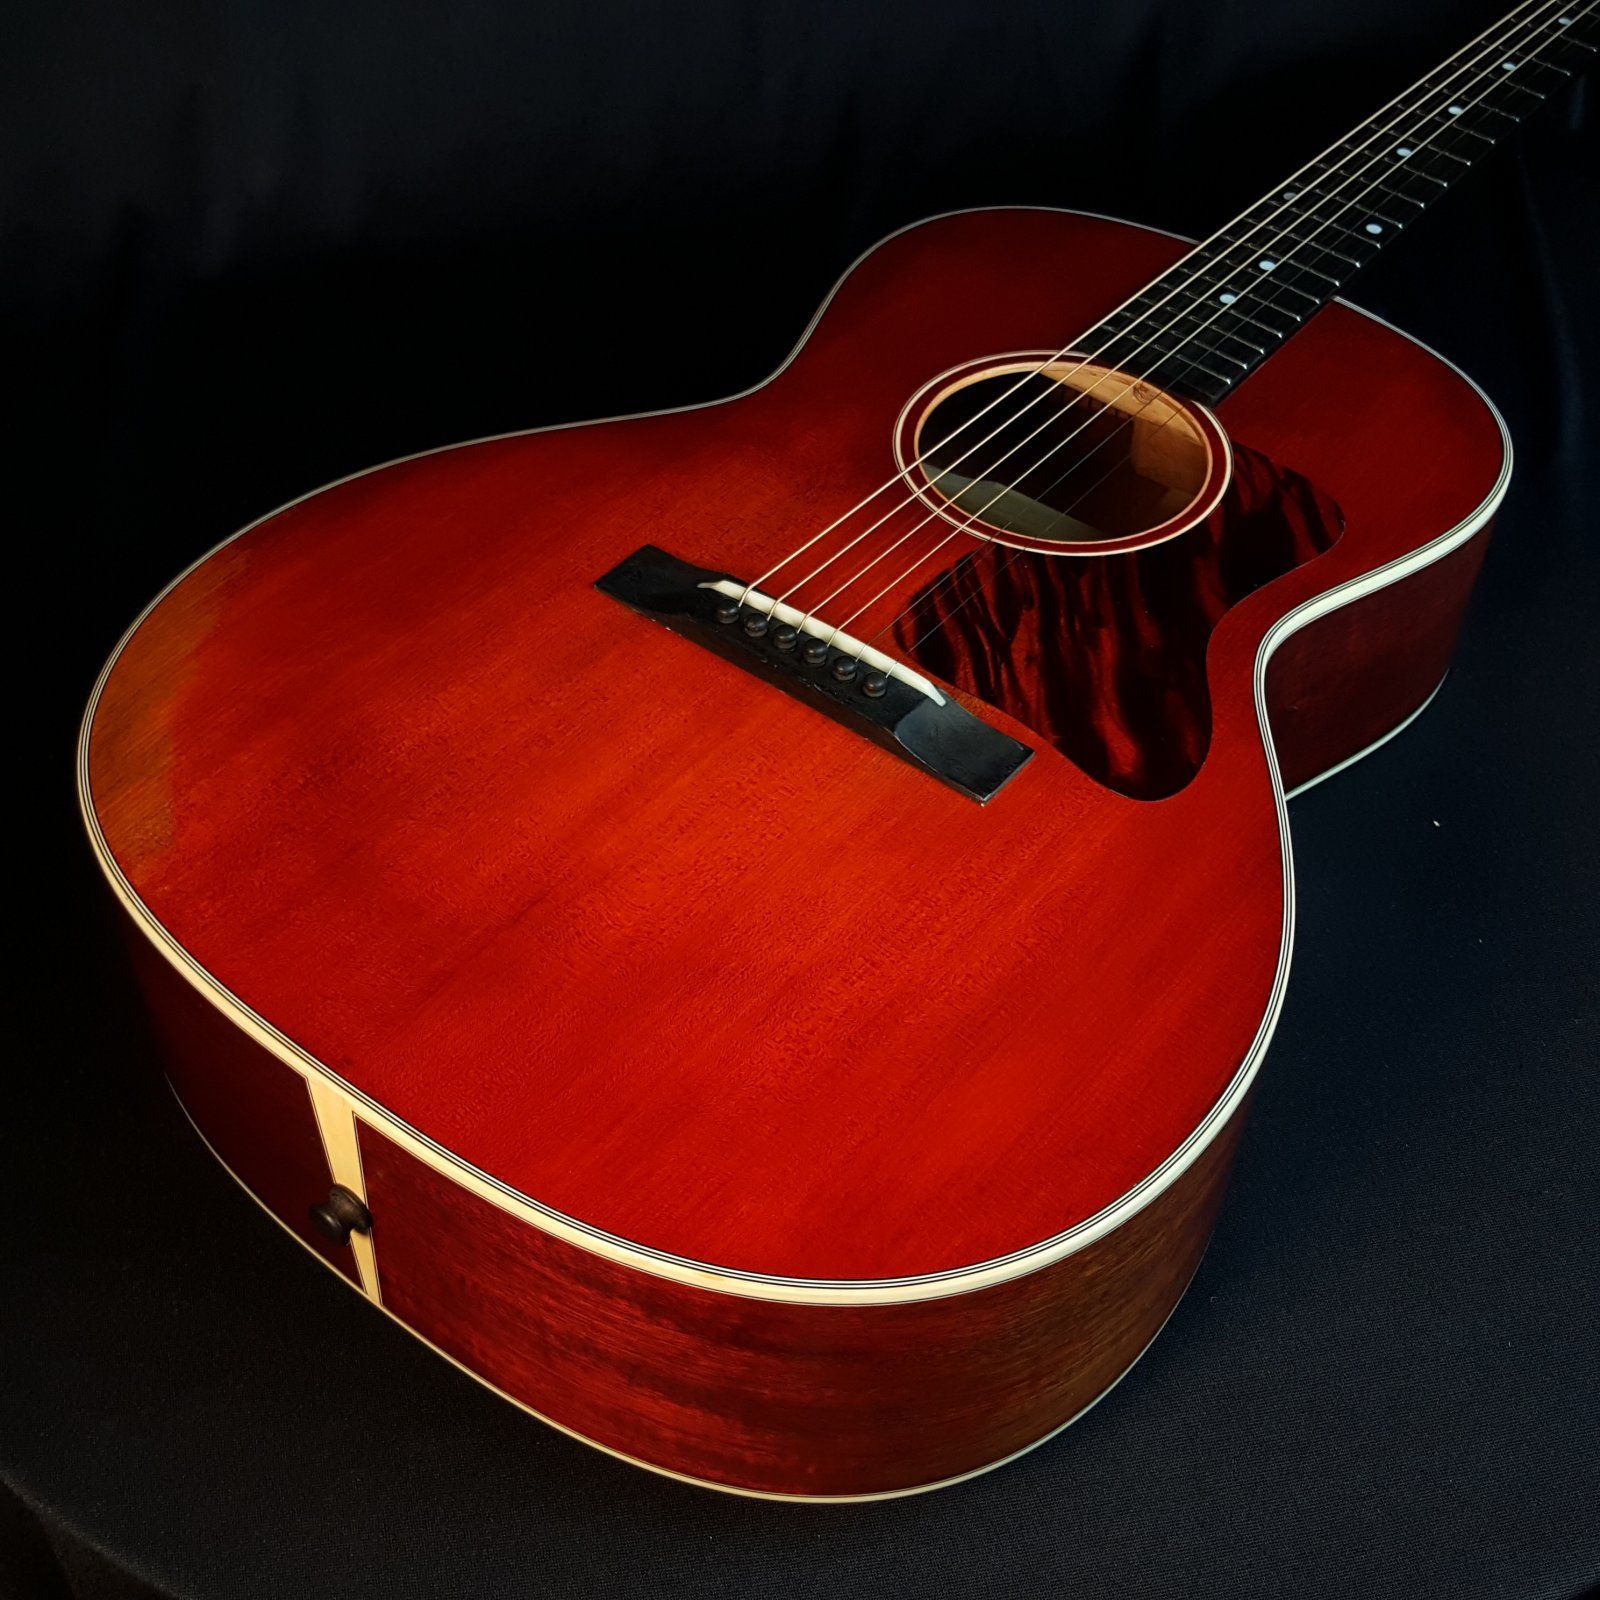 Eastman E10OOSS/V Antique Varnish Finish Acoustic Guitar 0318